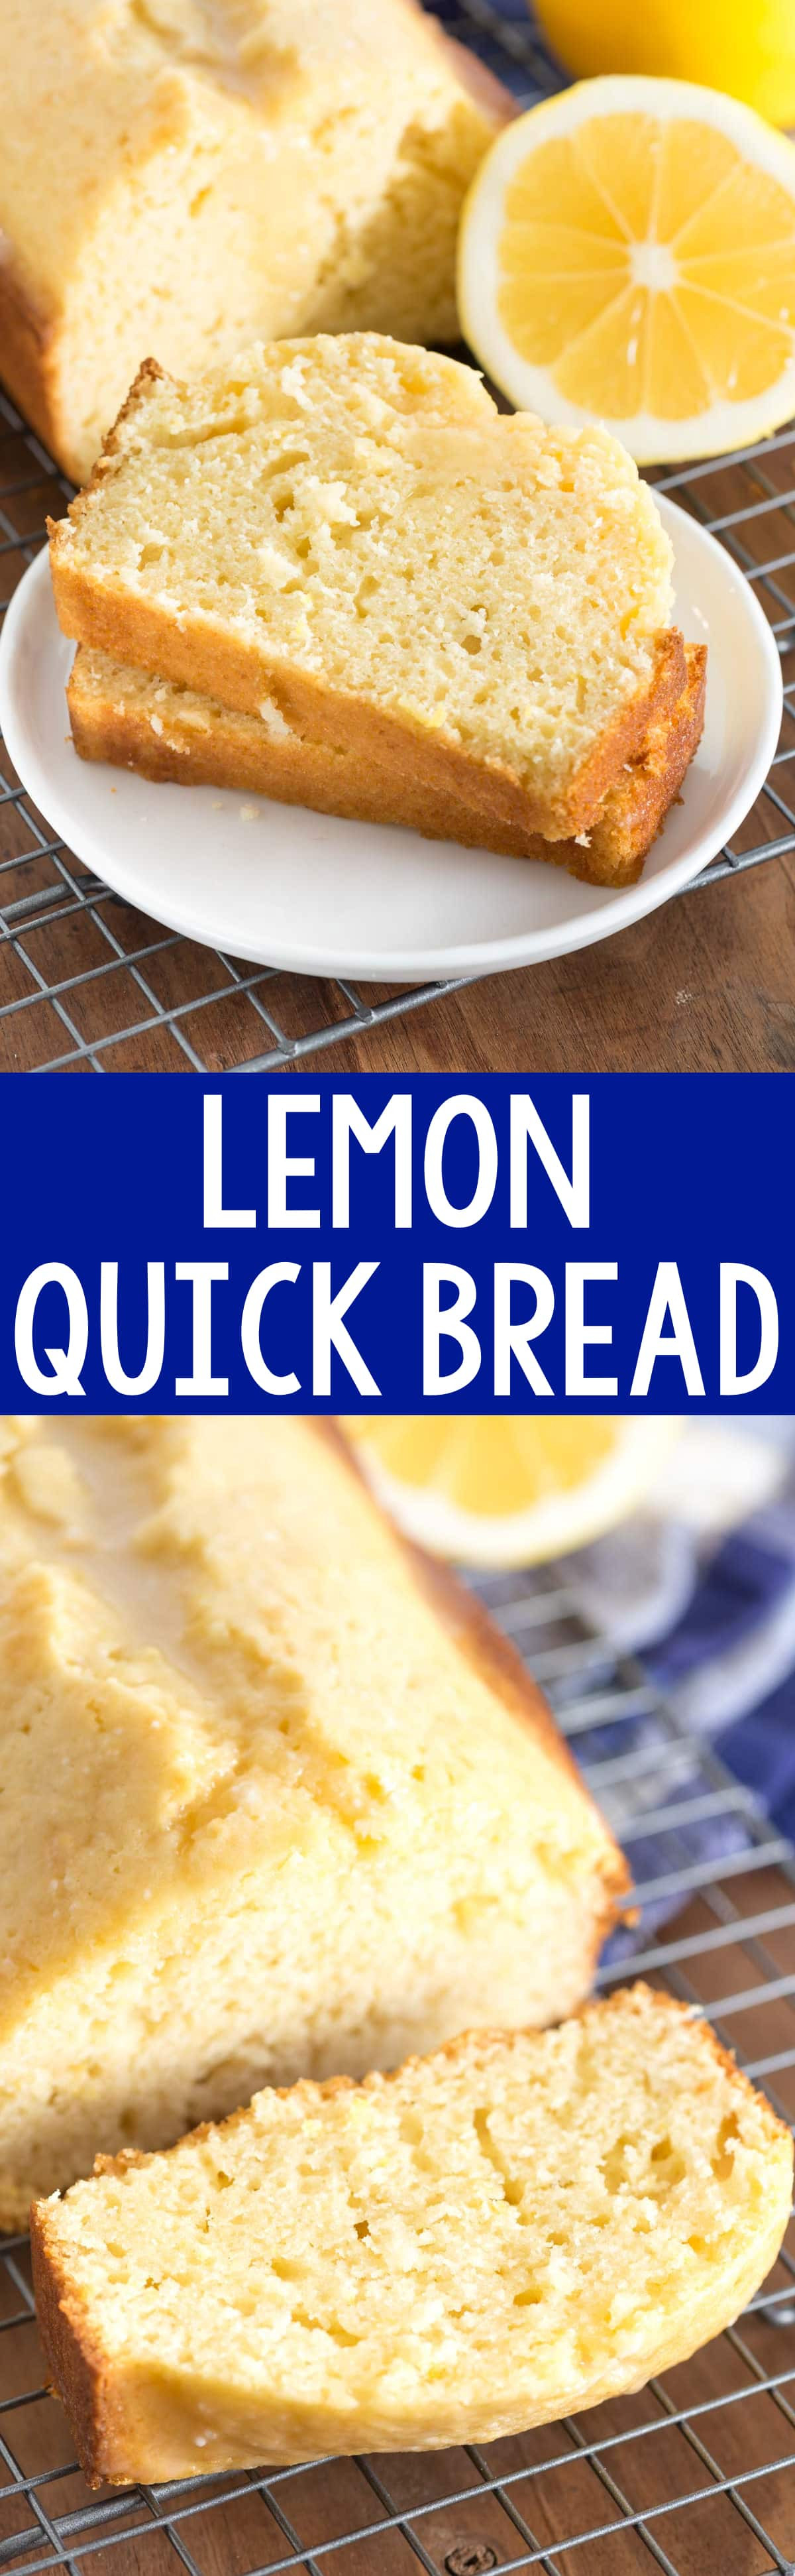 Dessert Bread Recipes  Lemon Quick Bread Crazy for Crust